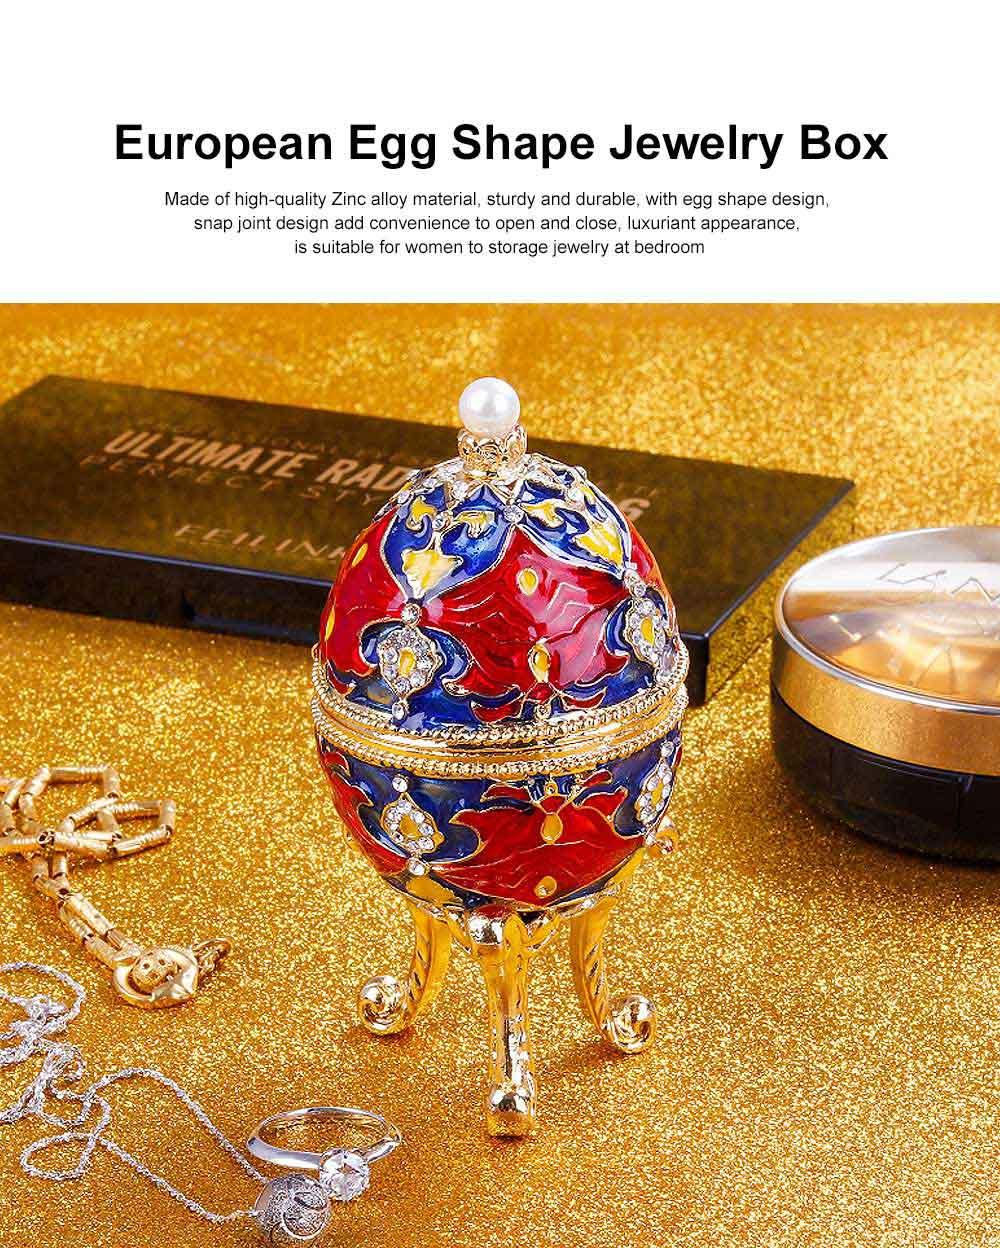 European Egg Shape Jewelry Box, Luxuriant Colored Enamel Trinket Keepsake Storage Box Collection Holder 0